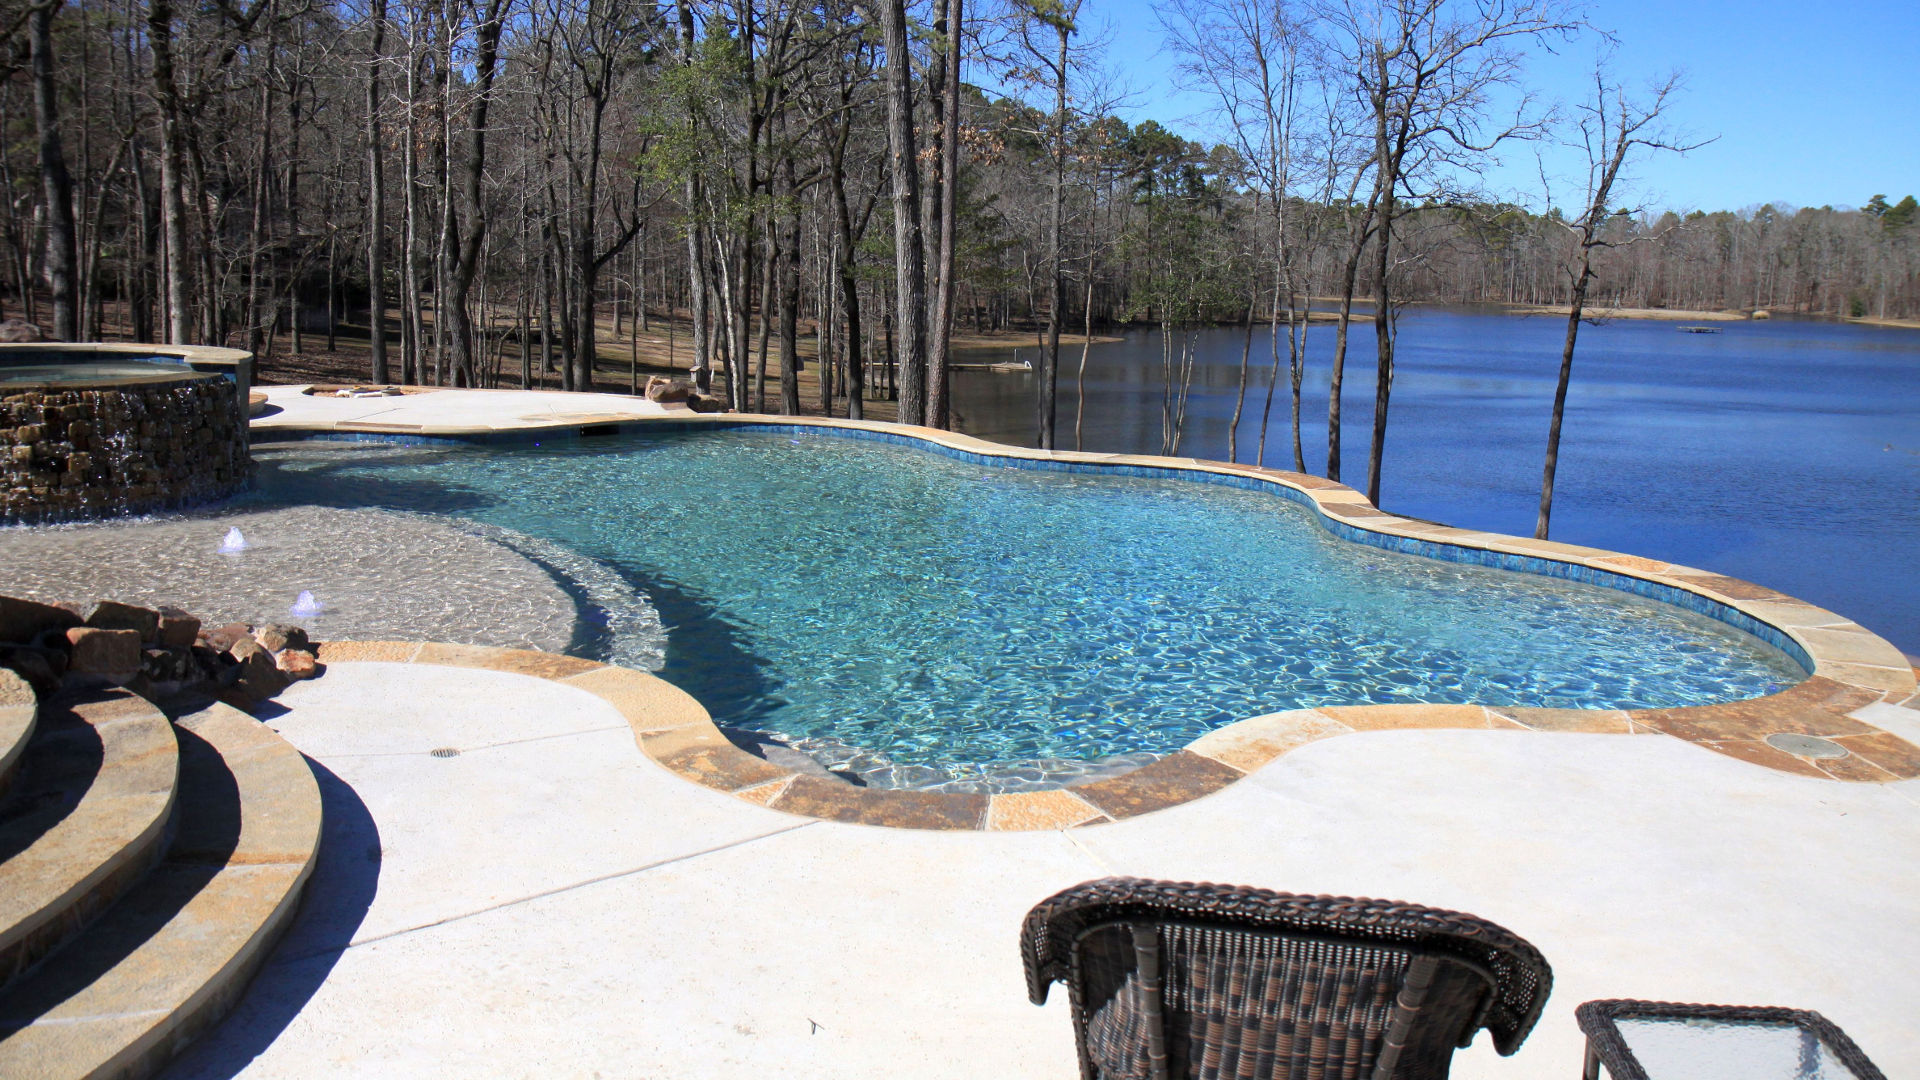 Custom Pool Builder Tyler Texas Gunite Construction Above Ground Outdoor Living Renovation Service And Repair